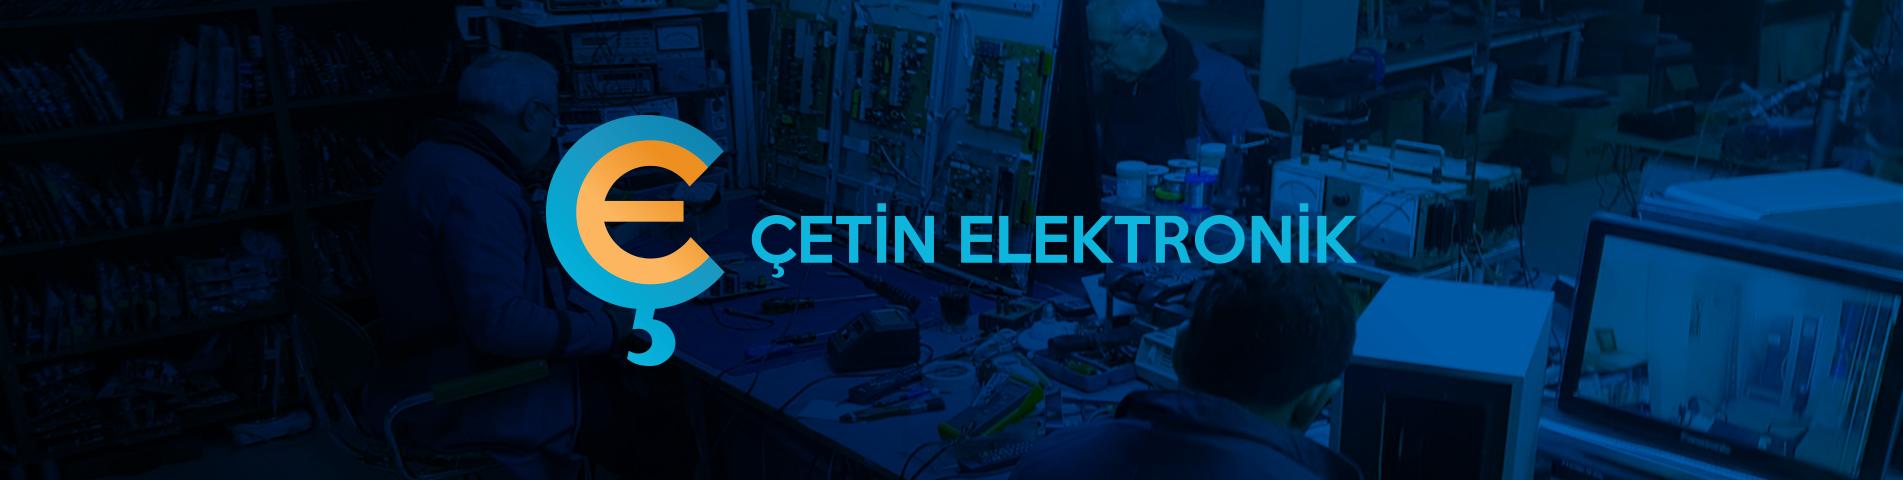 Çetin Elektronik